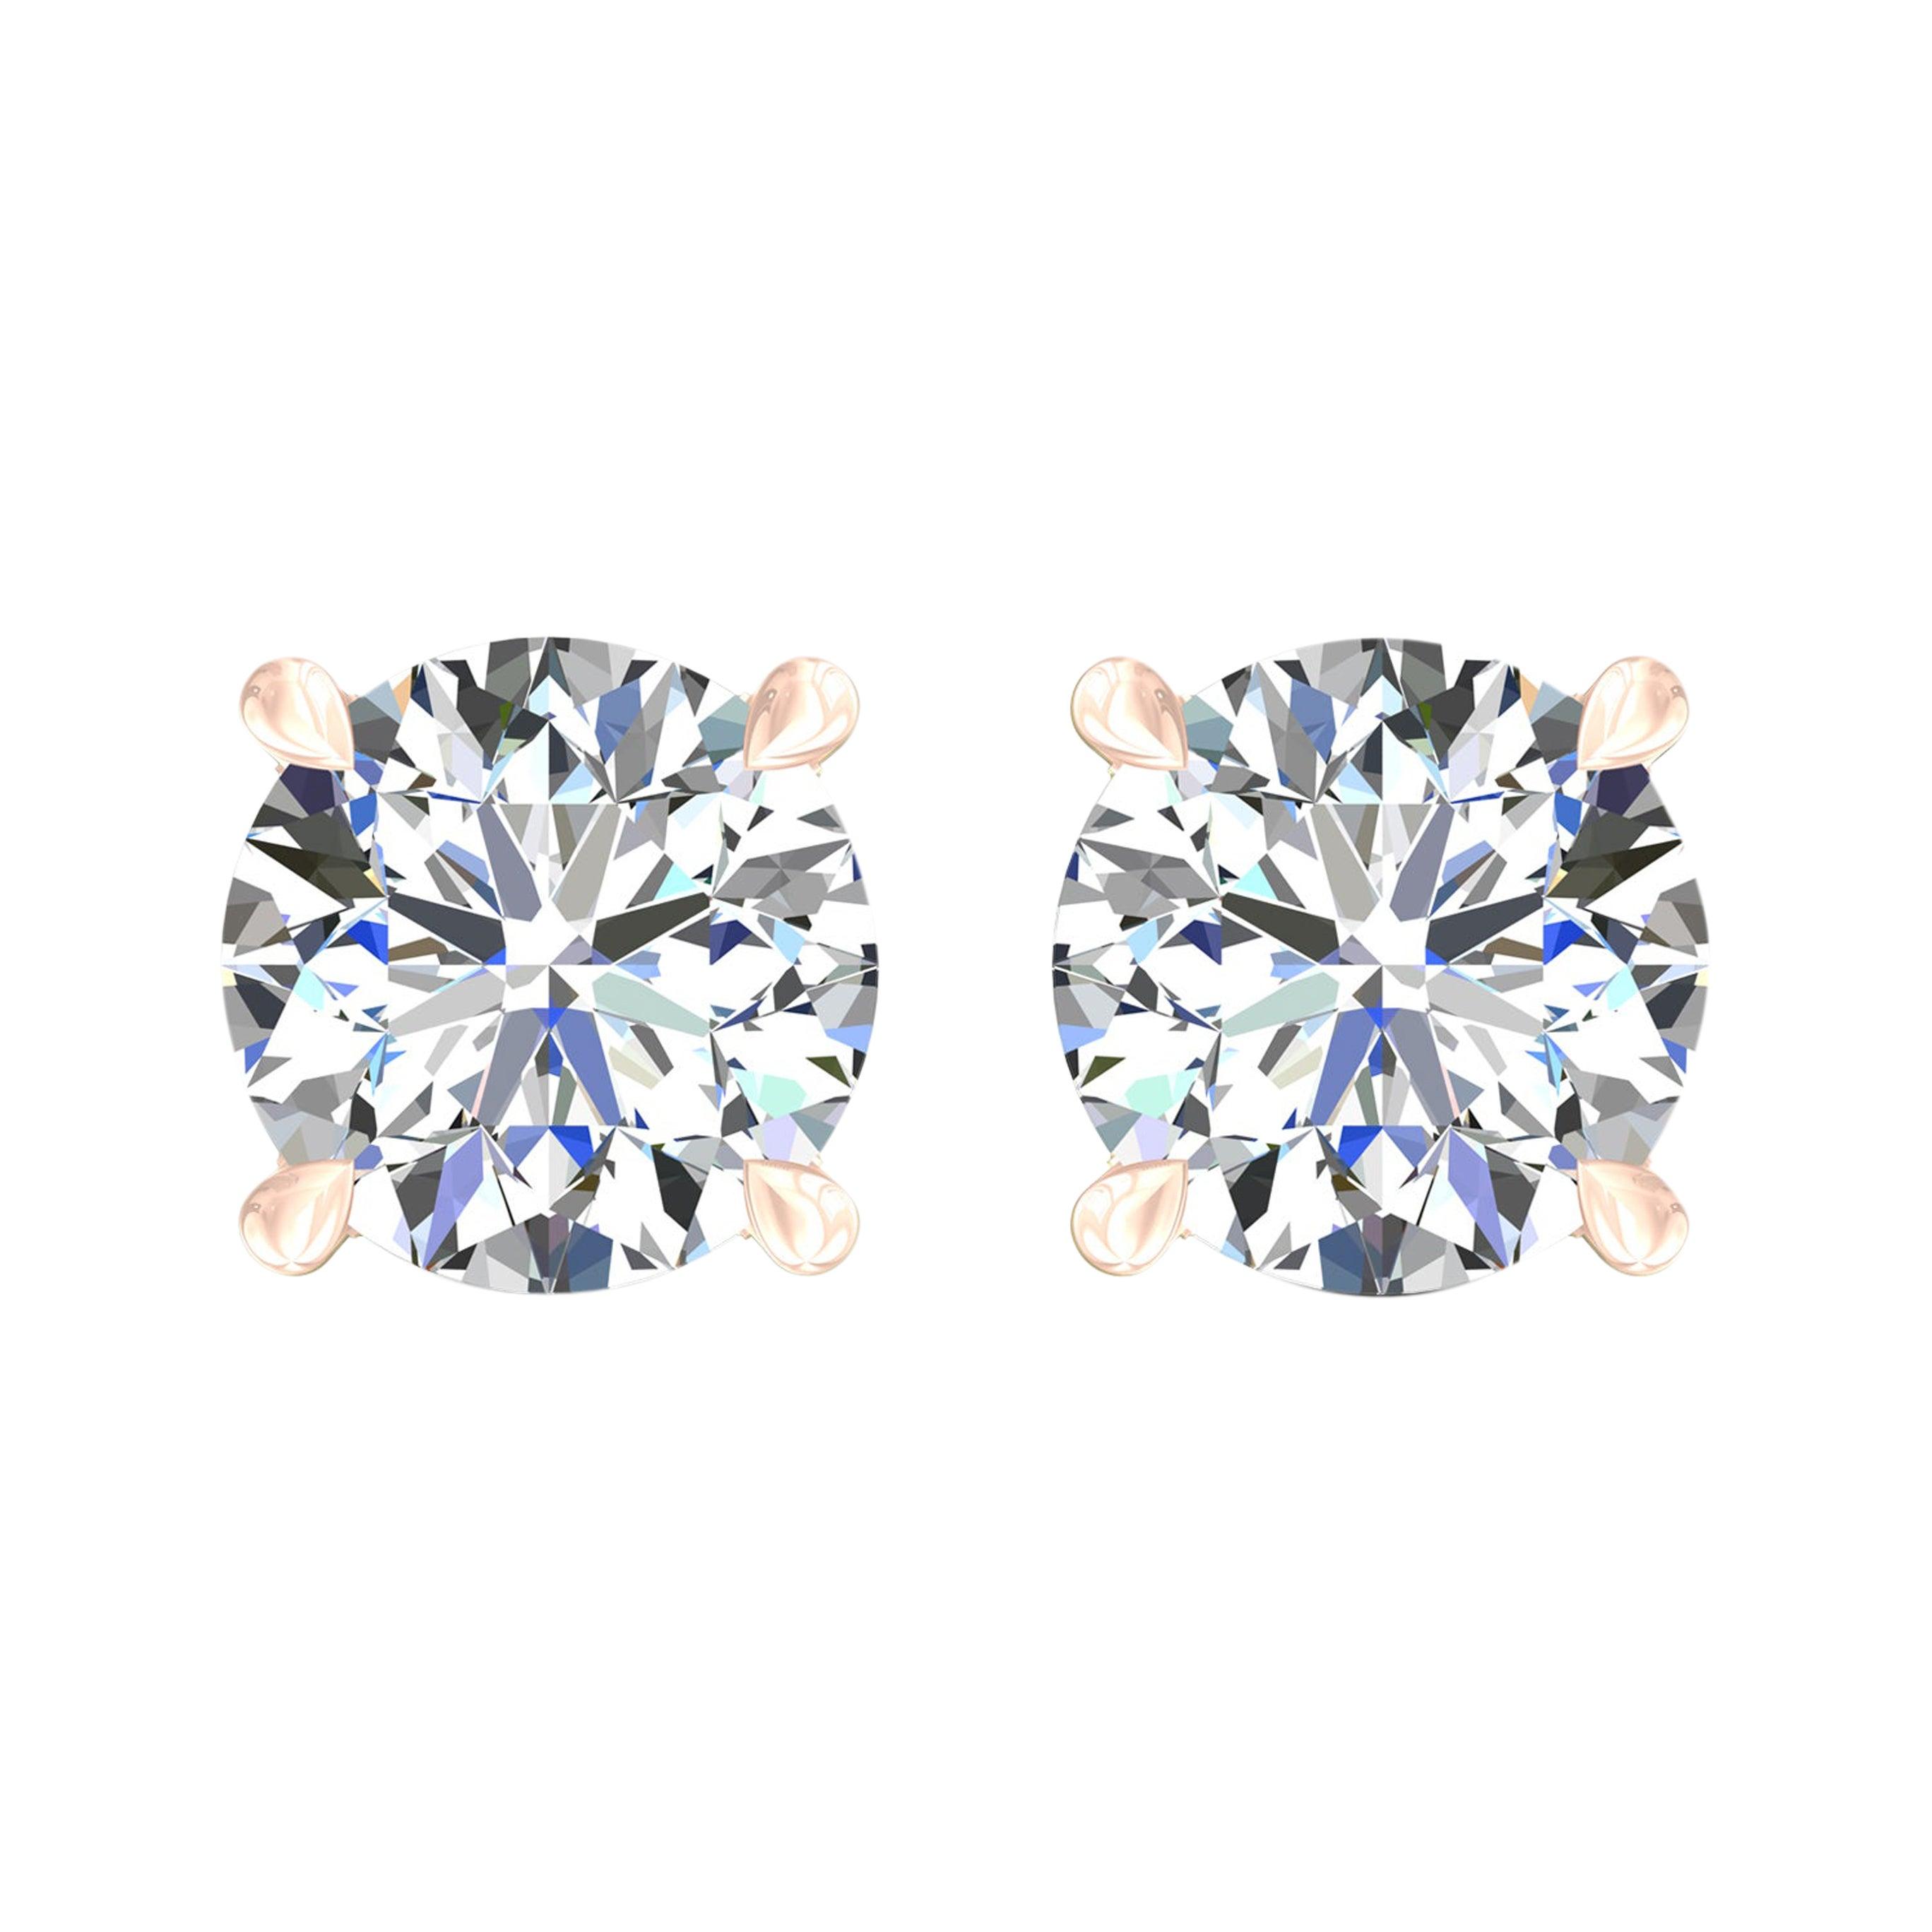 Harakh GIA Certified 0.68 Carat F Color VS2 Clarity 18 KT Diamond Stud Earrings